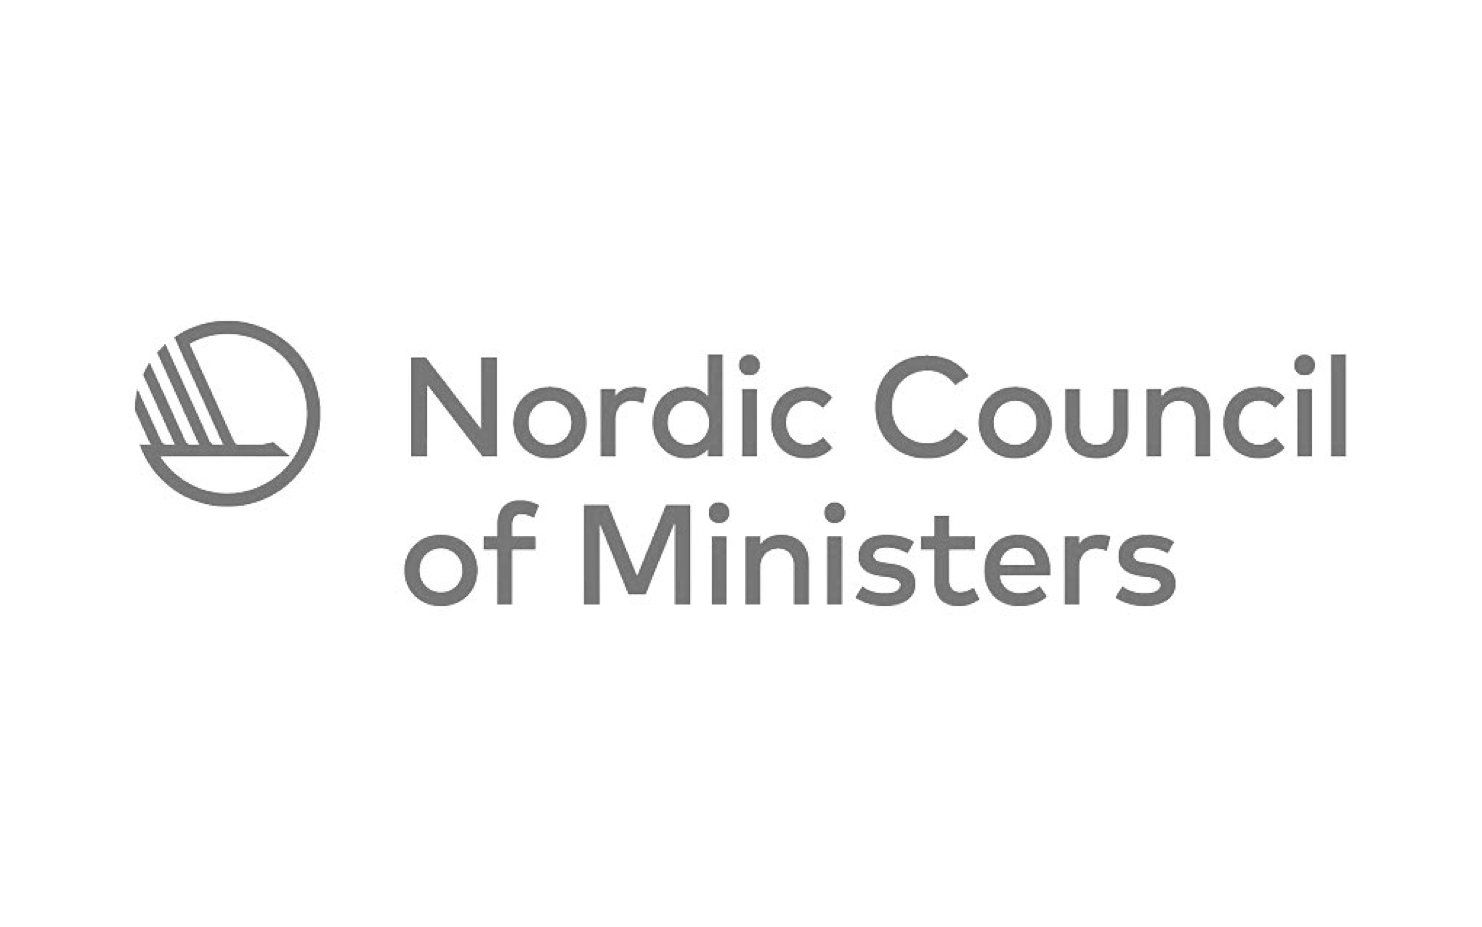 Nordic Council Logo.png